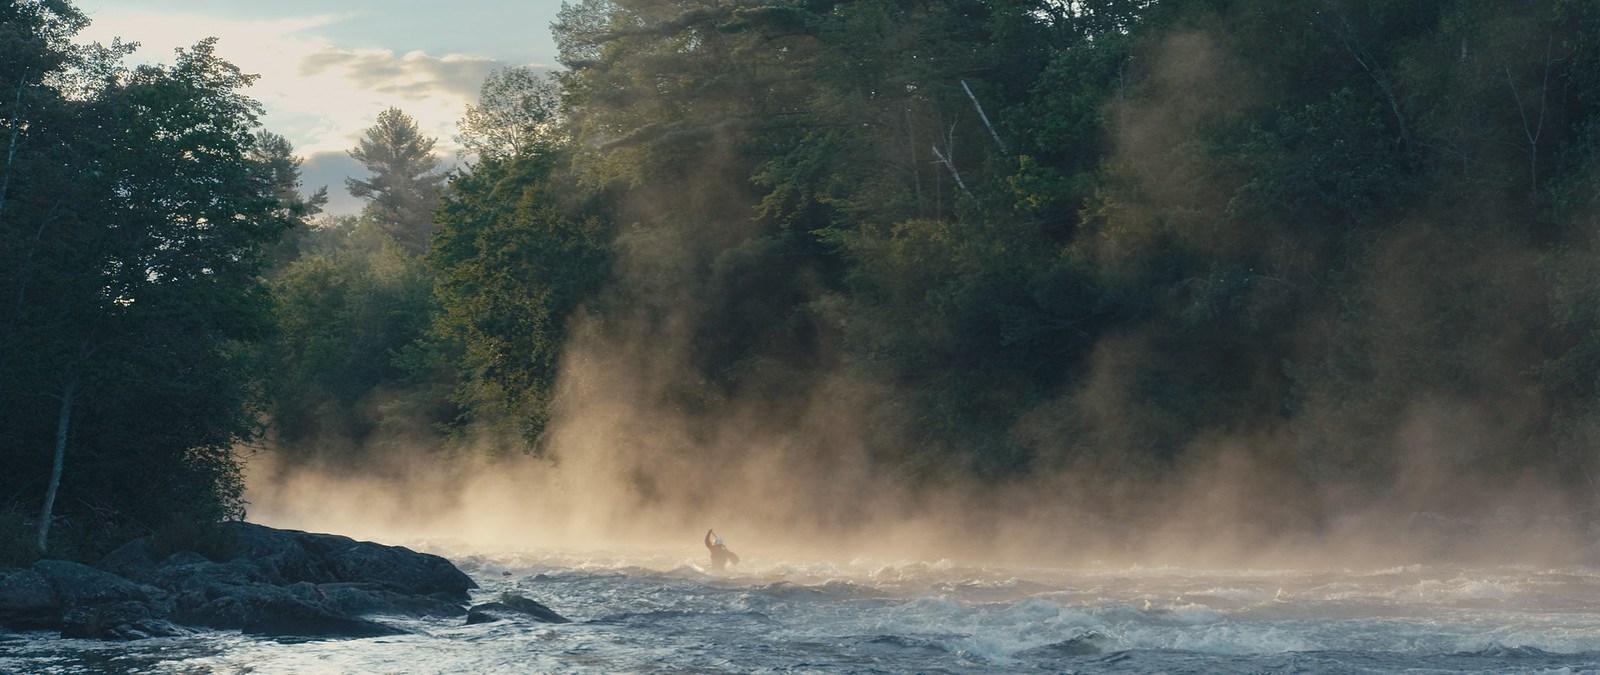 THE CANOE_SCREEN SHOTS_BLOG-13